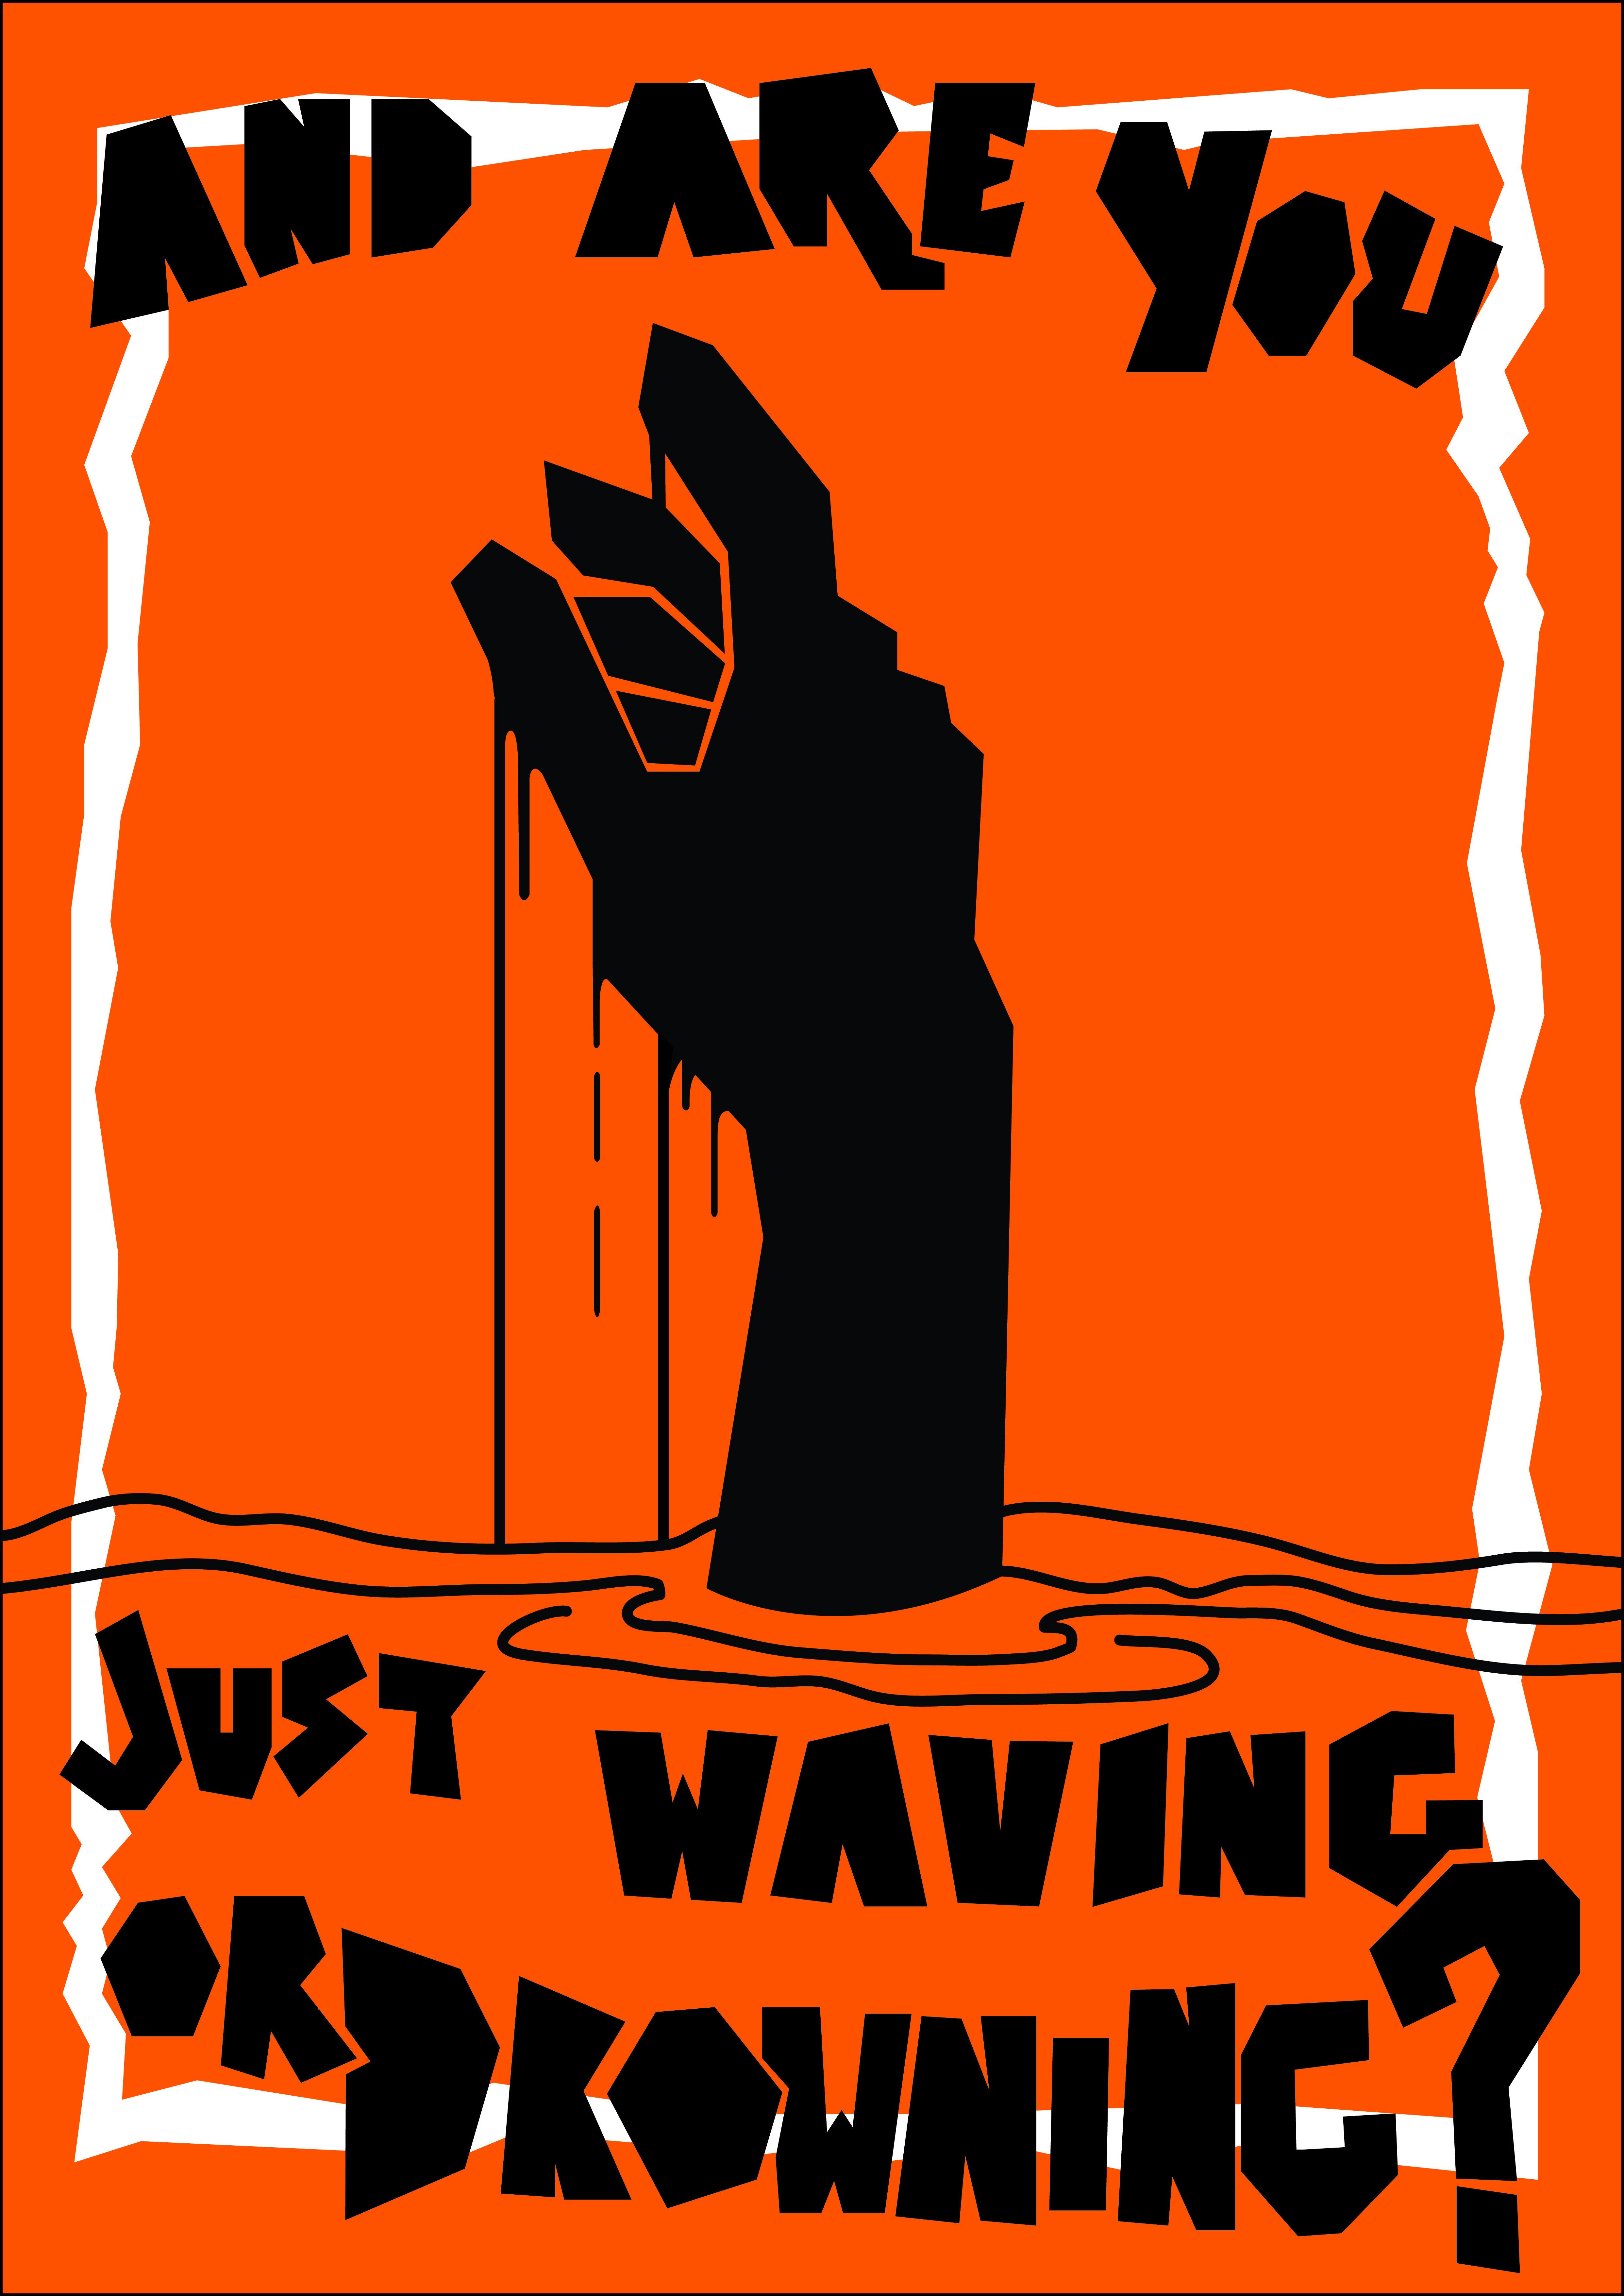 Waving?